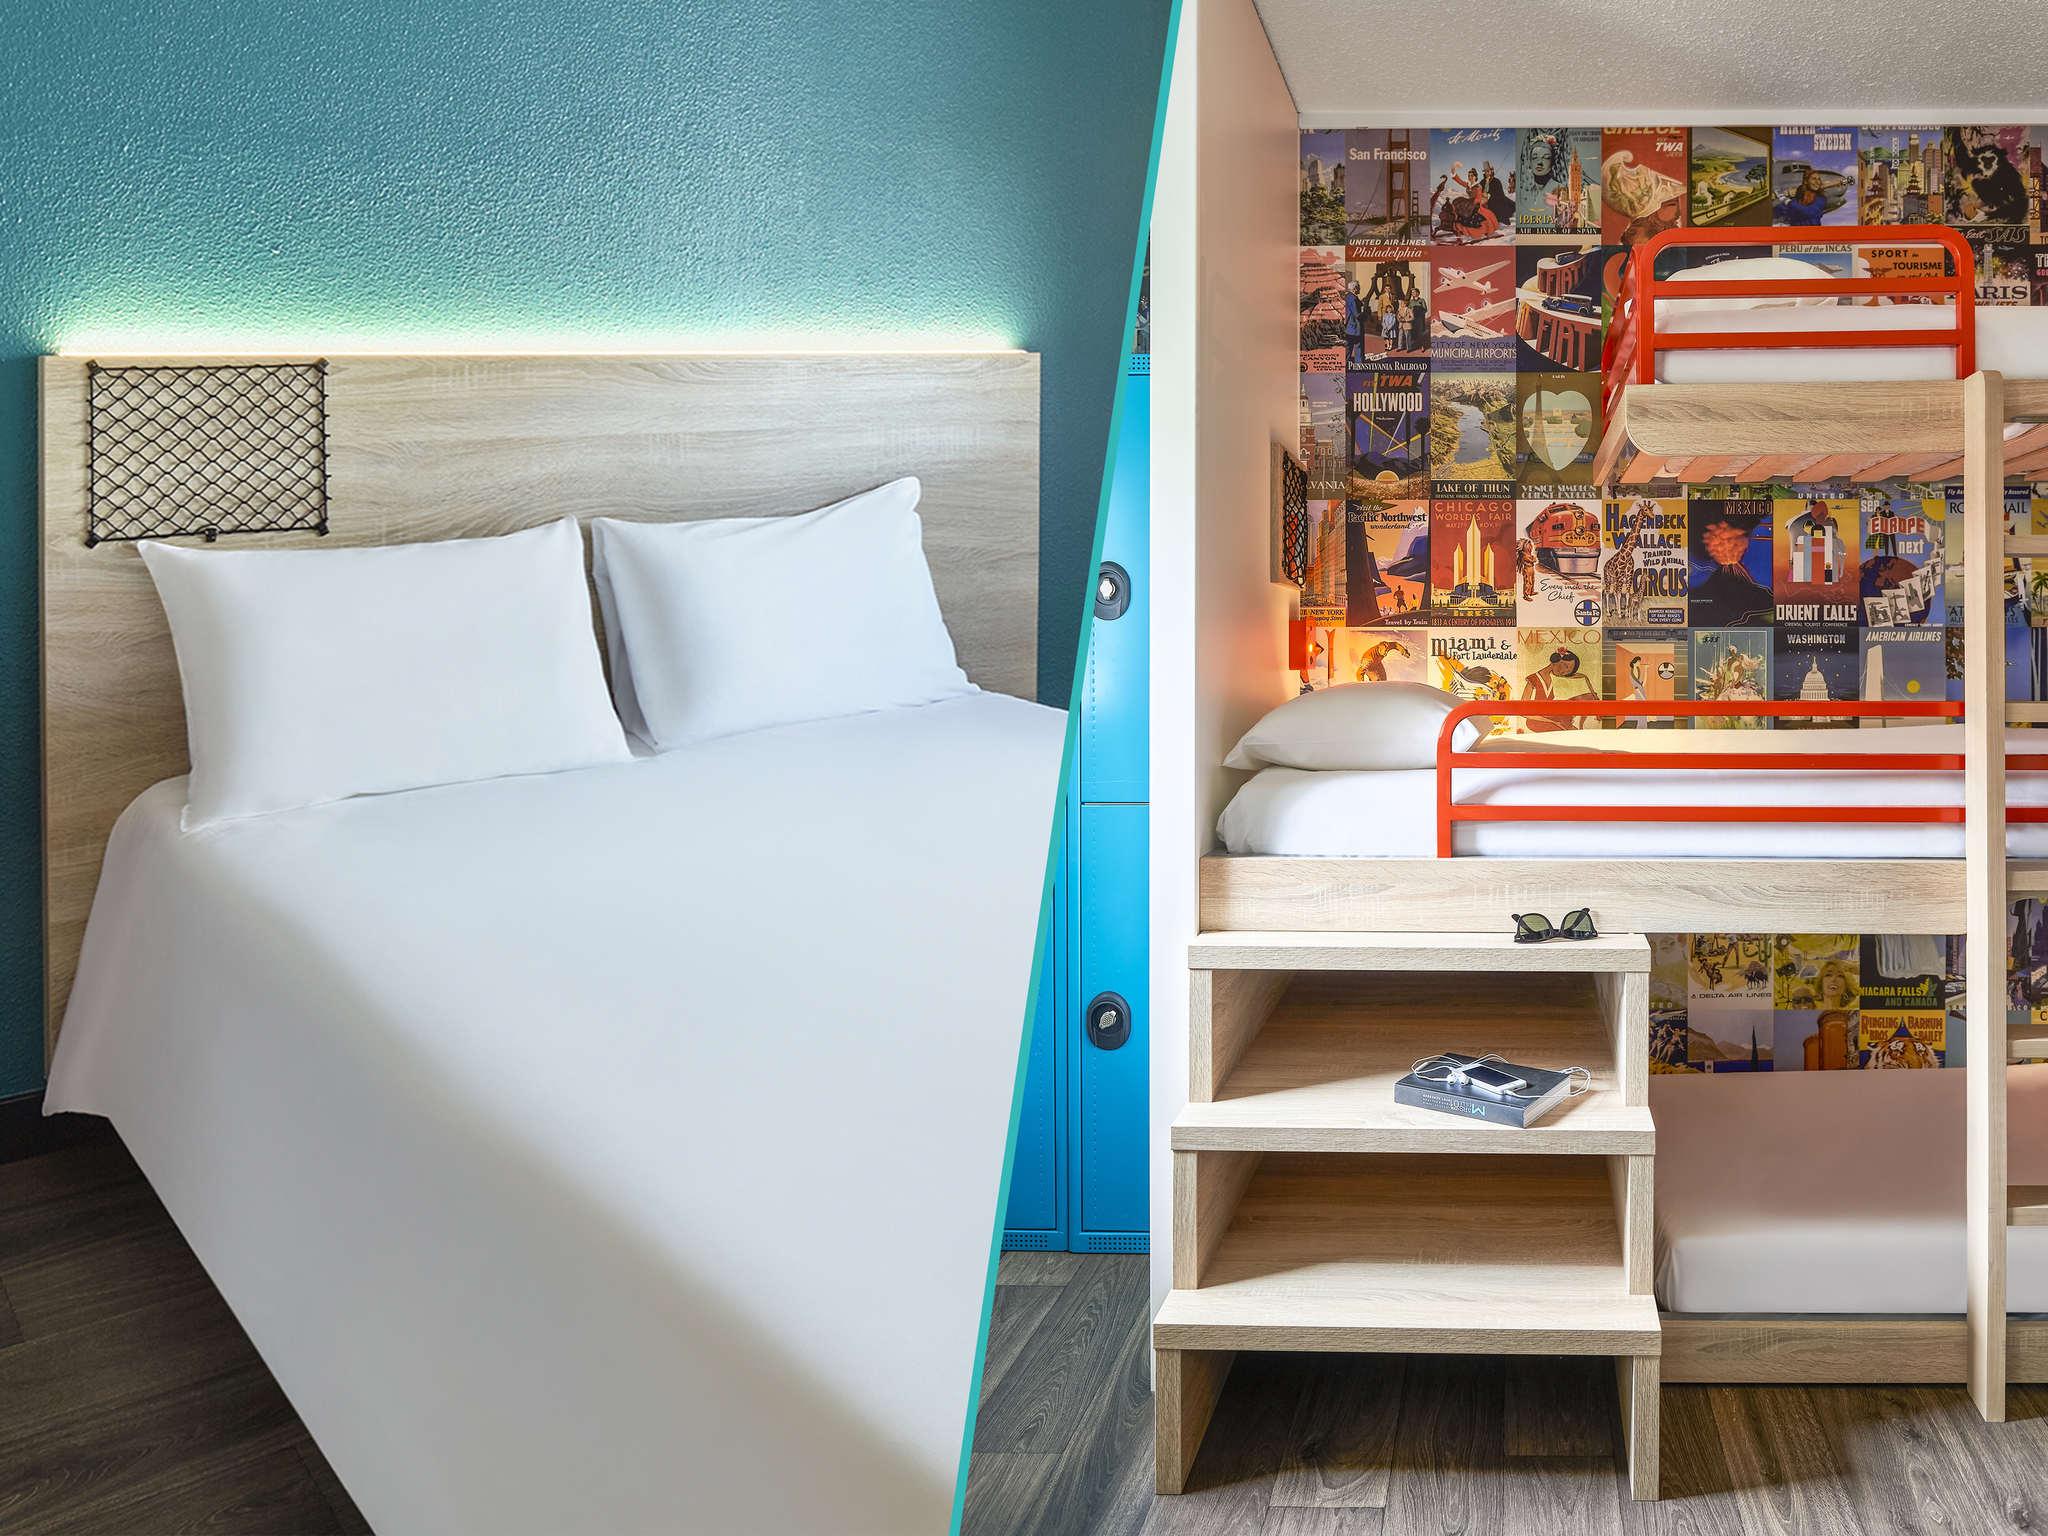 Hotel - hotelF1 Paris Porte de Châtillon